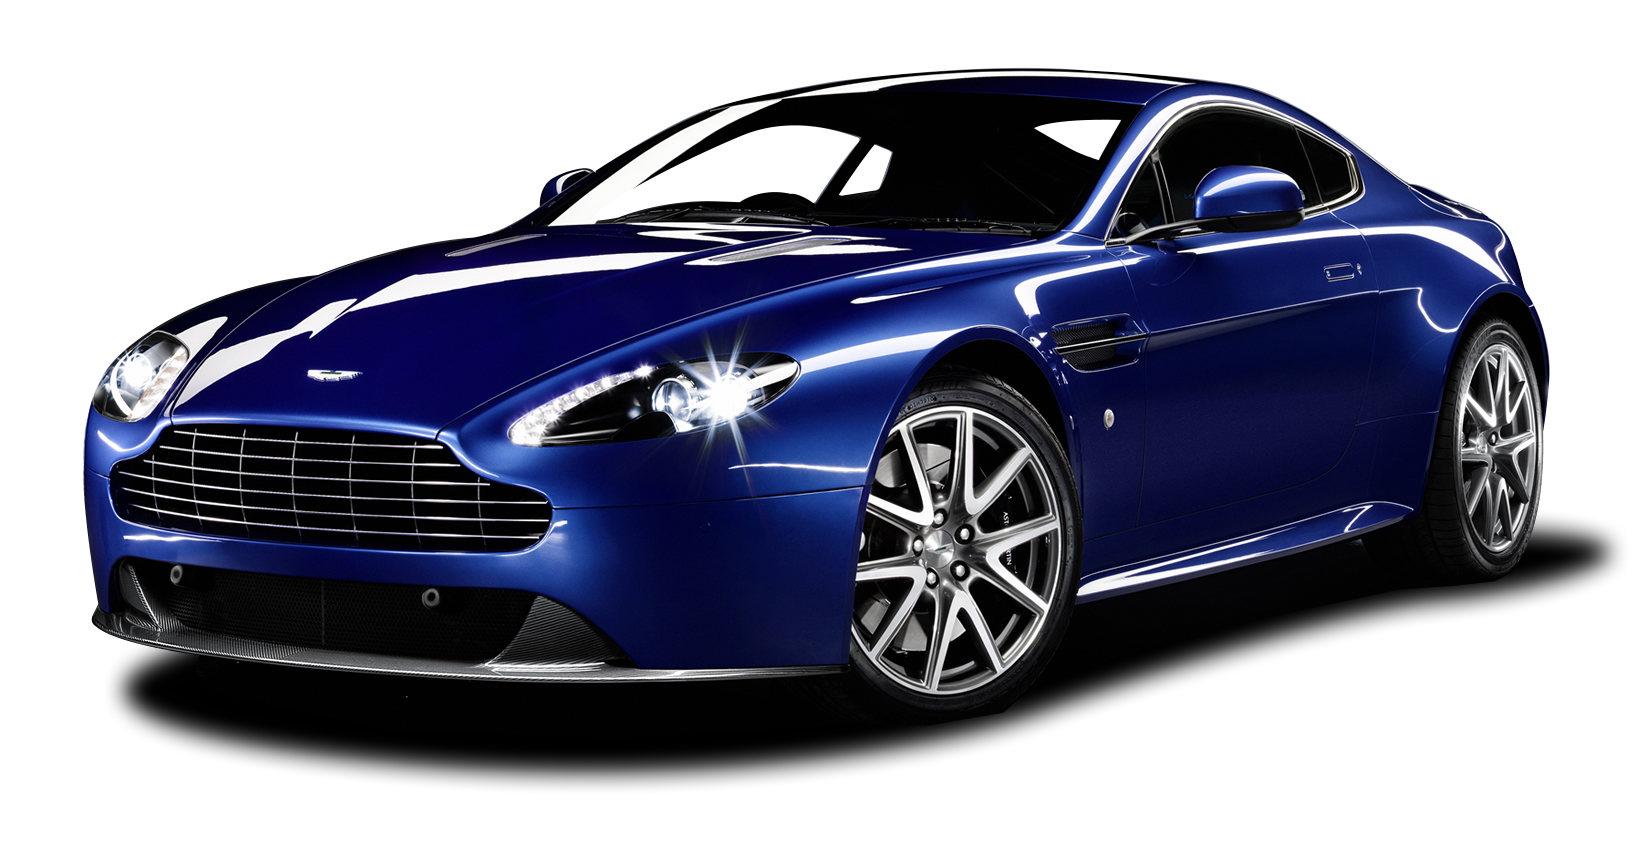 Aston Martin Vantage S Wallpapers Vehicles Hq Aston Martin Vantage S Pictures 4k Wallpapers 2019